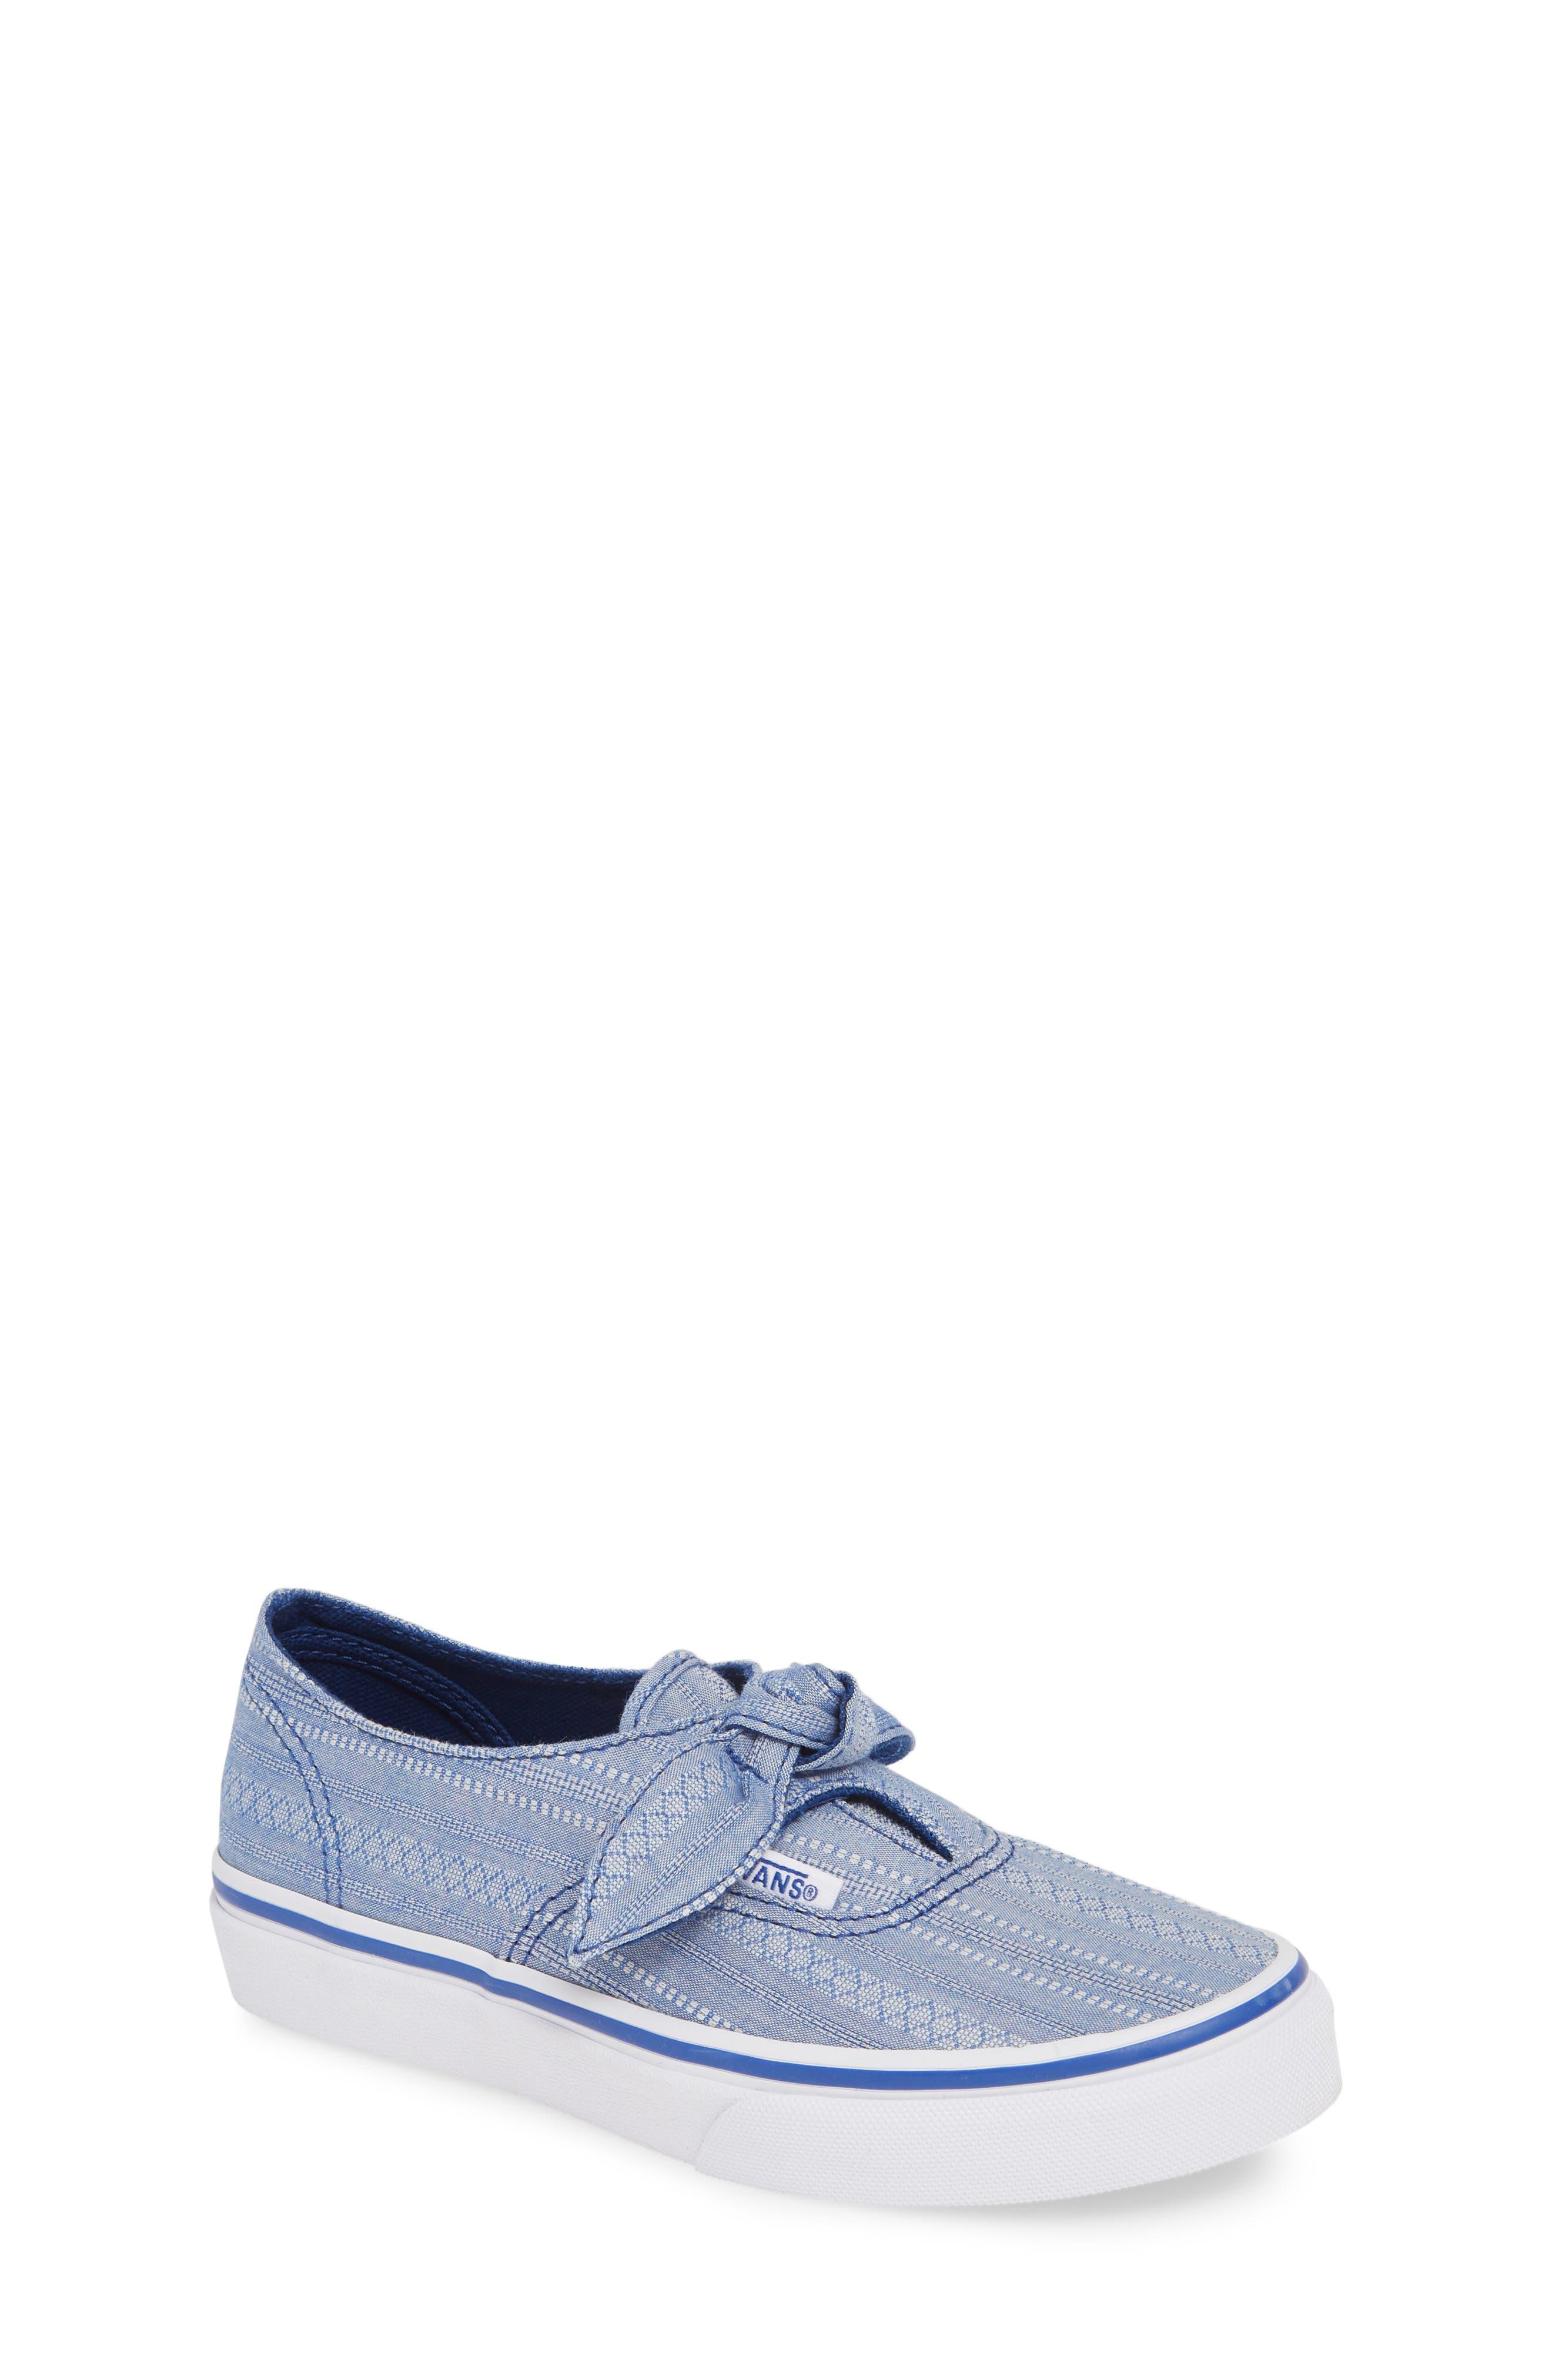 Girls Vans Authentic Knot SlipOn Sneaker